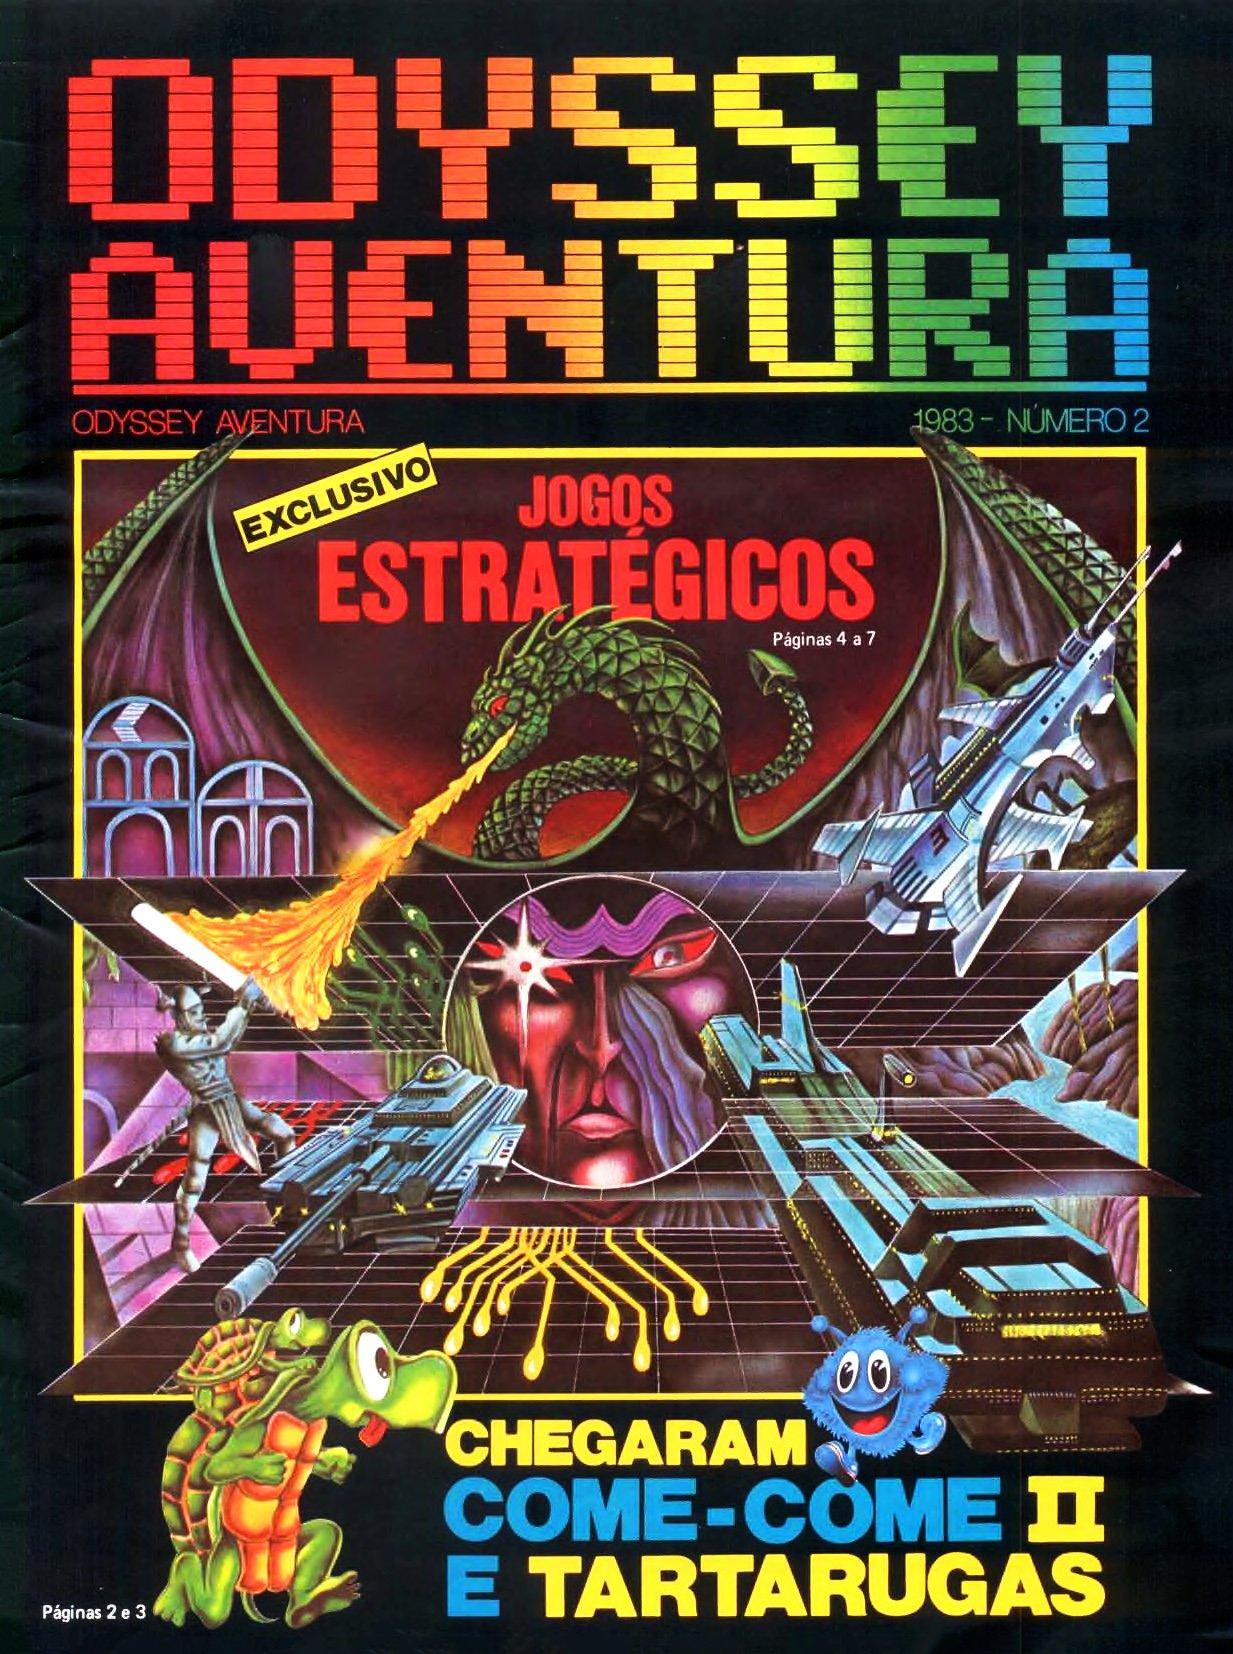 Odyssey Aventura Issue 2 (1983)